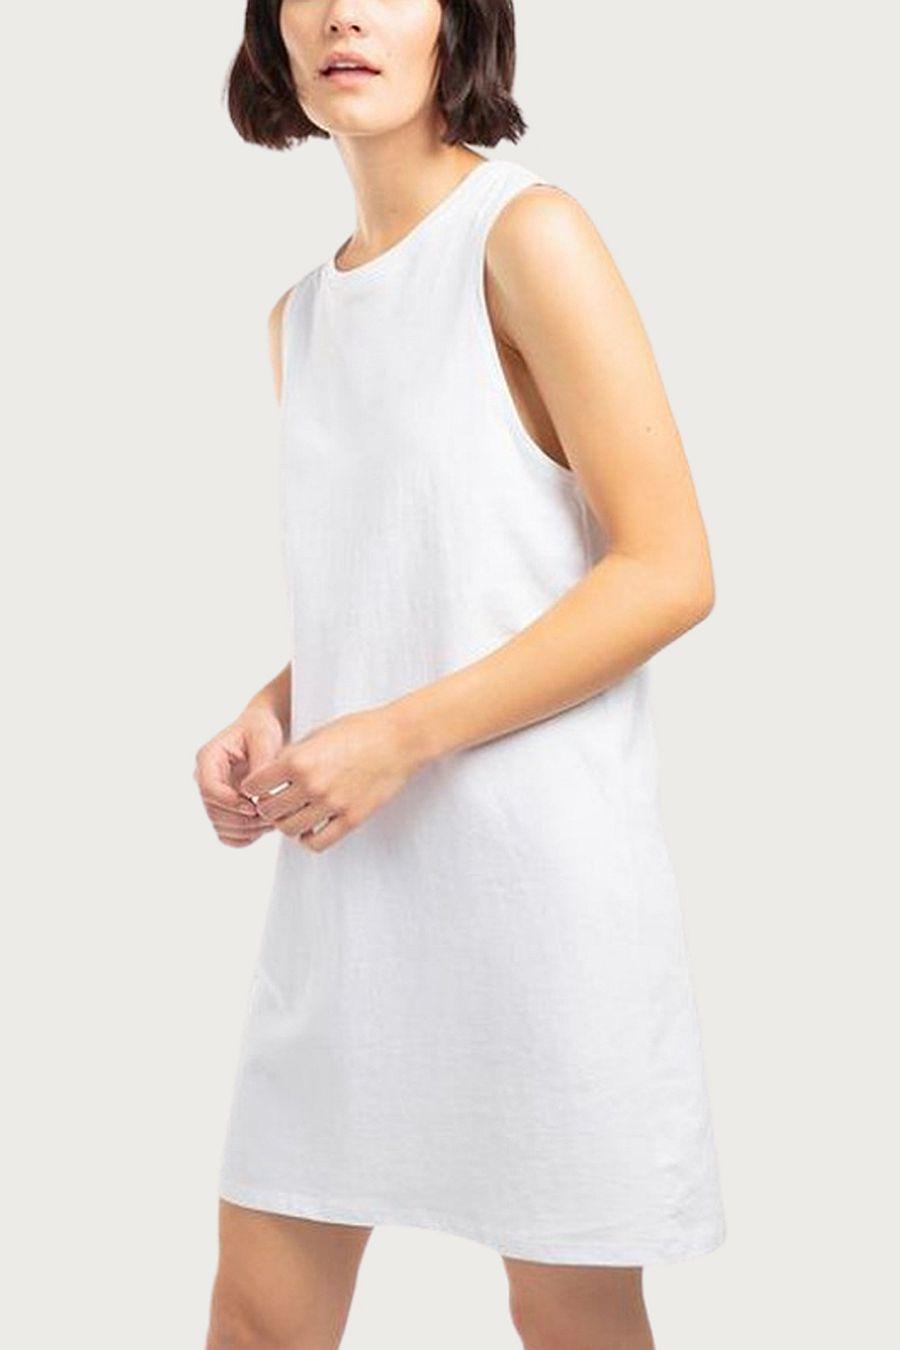 Richer Poorer Women's Tank Dress - White